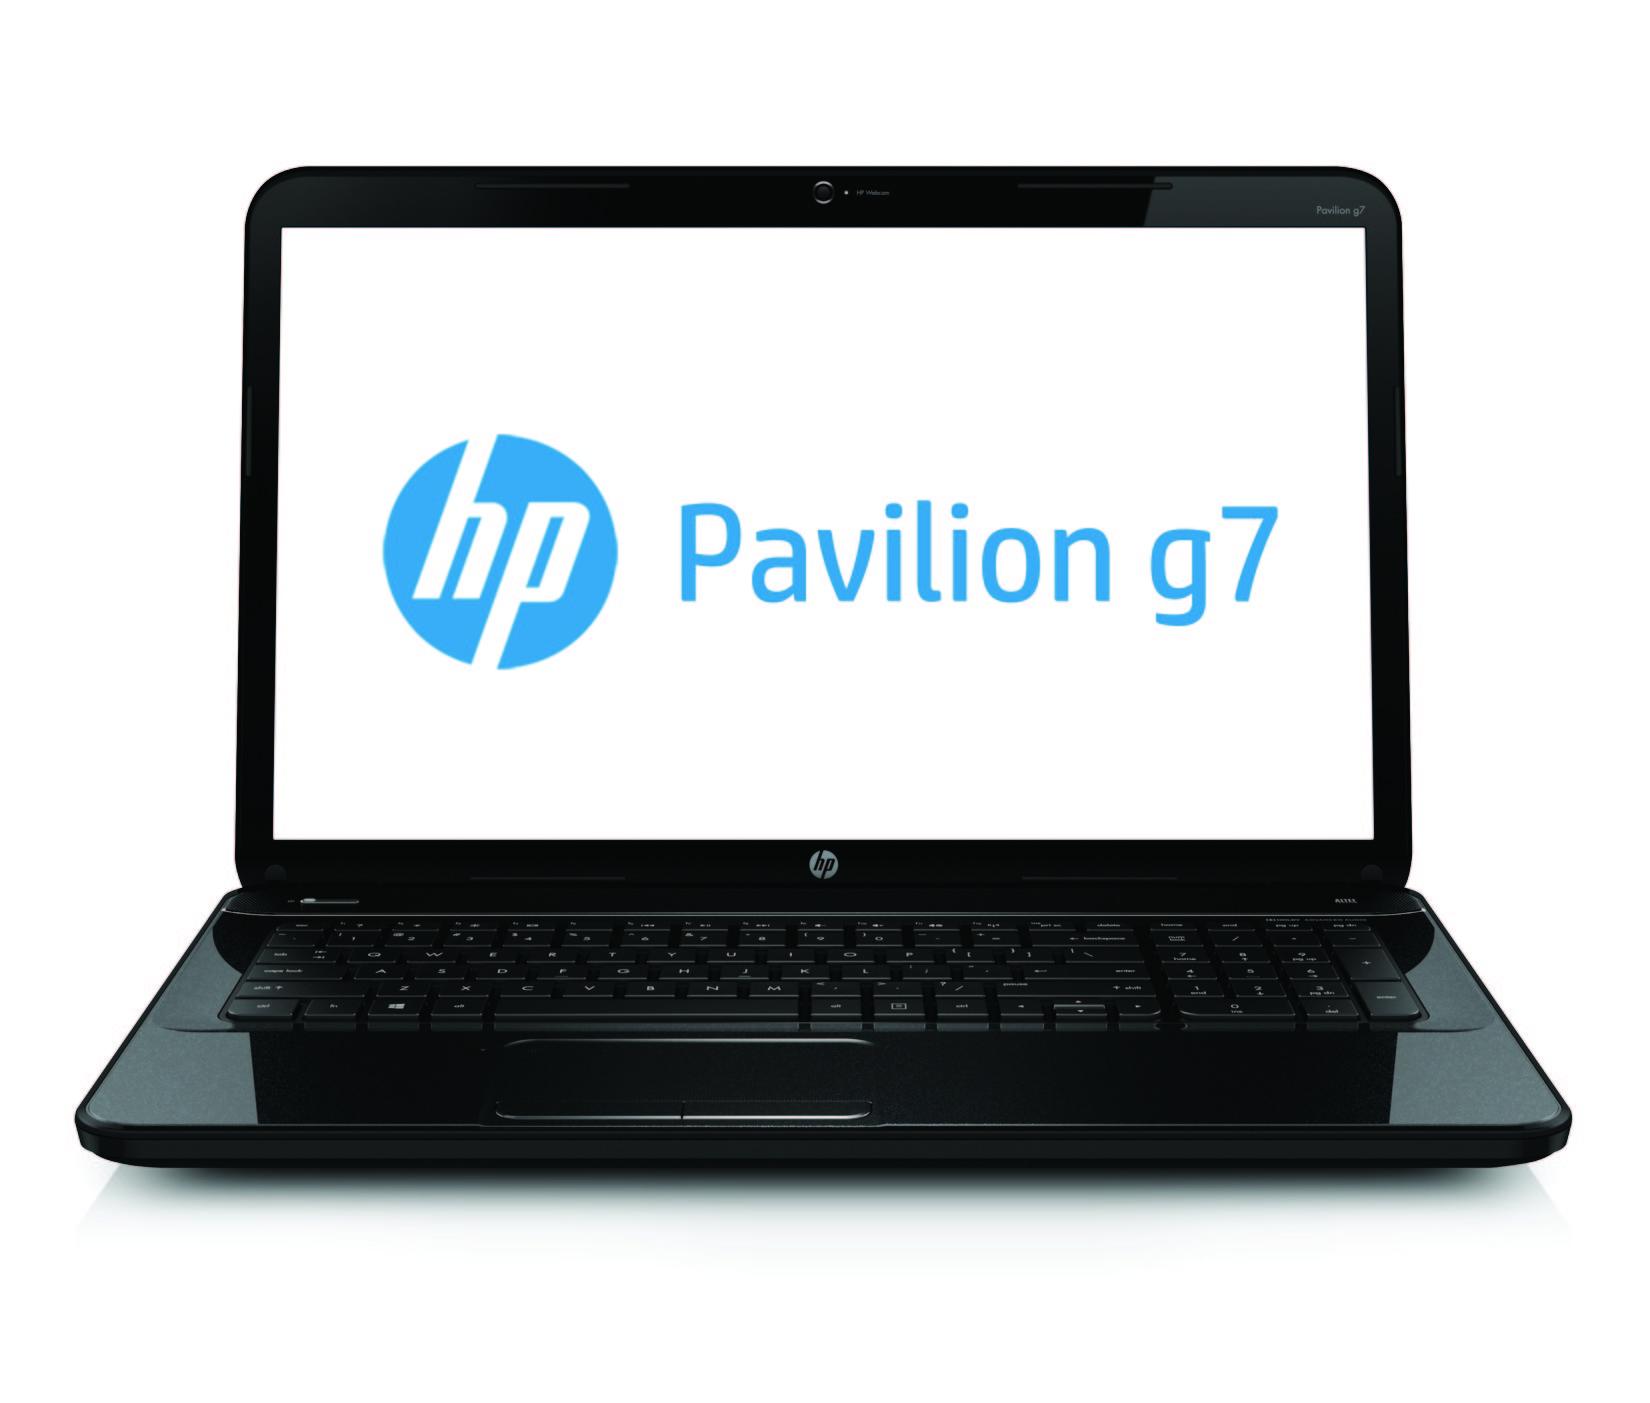 http://g-ec2.images-amazon.com/images/G/02/uk-electronics/product_content/HP/G7_L._V372334091_.jpg